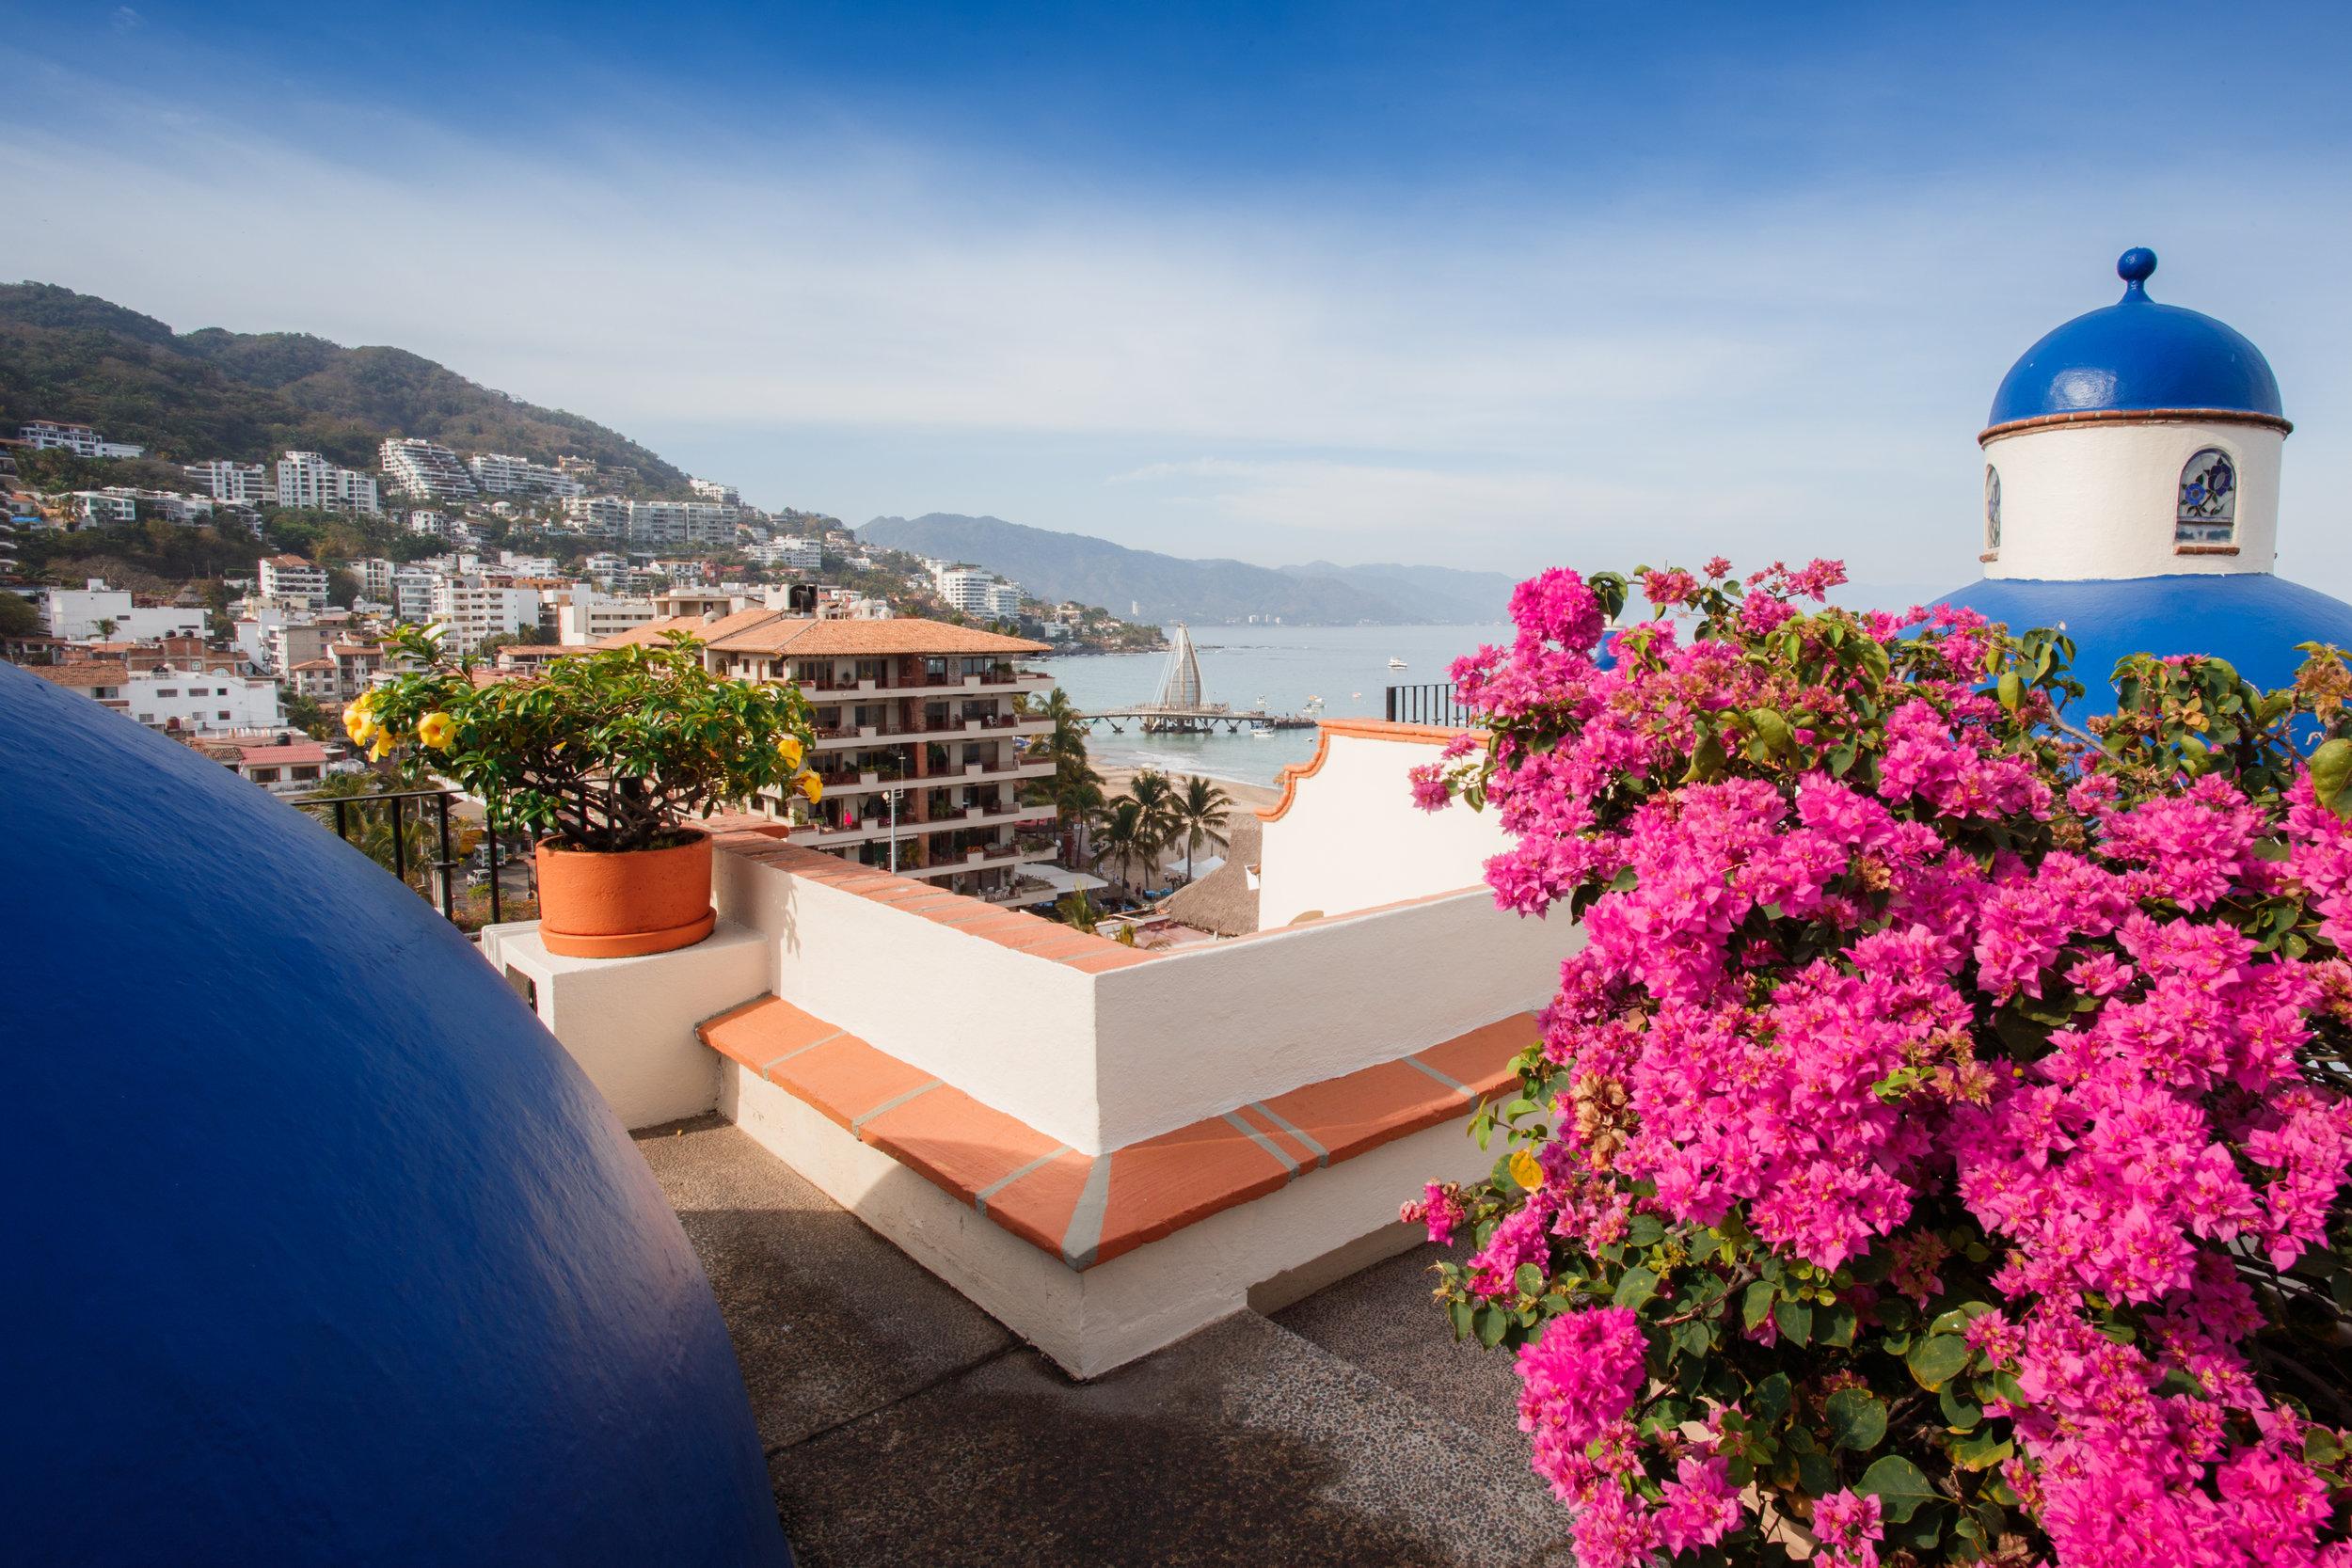 Vacation Vallarta Plazamar Rooftop Views